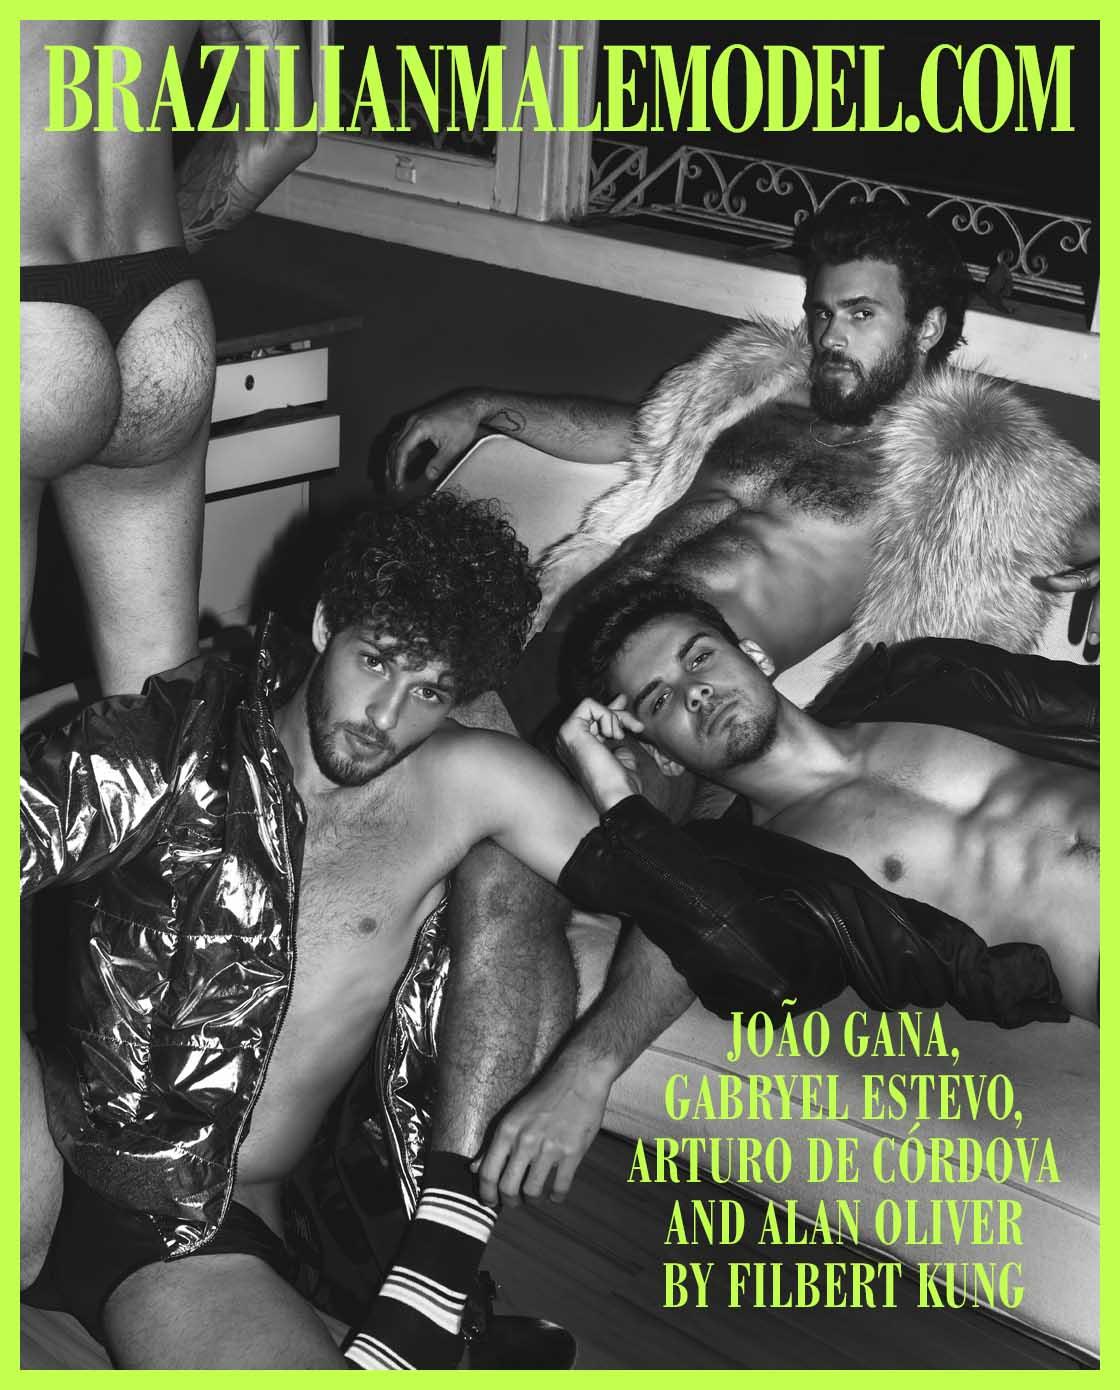 João Gana, Gabryel Estevo, Arturo de Córdova and Alan Oliver by Filbert Kung